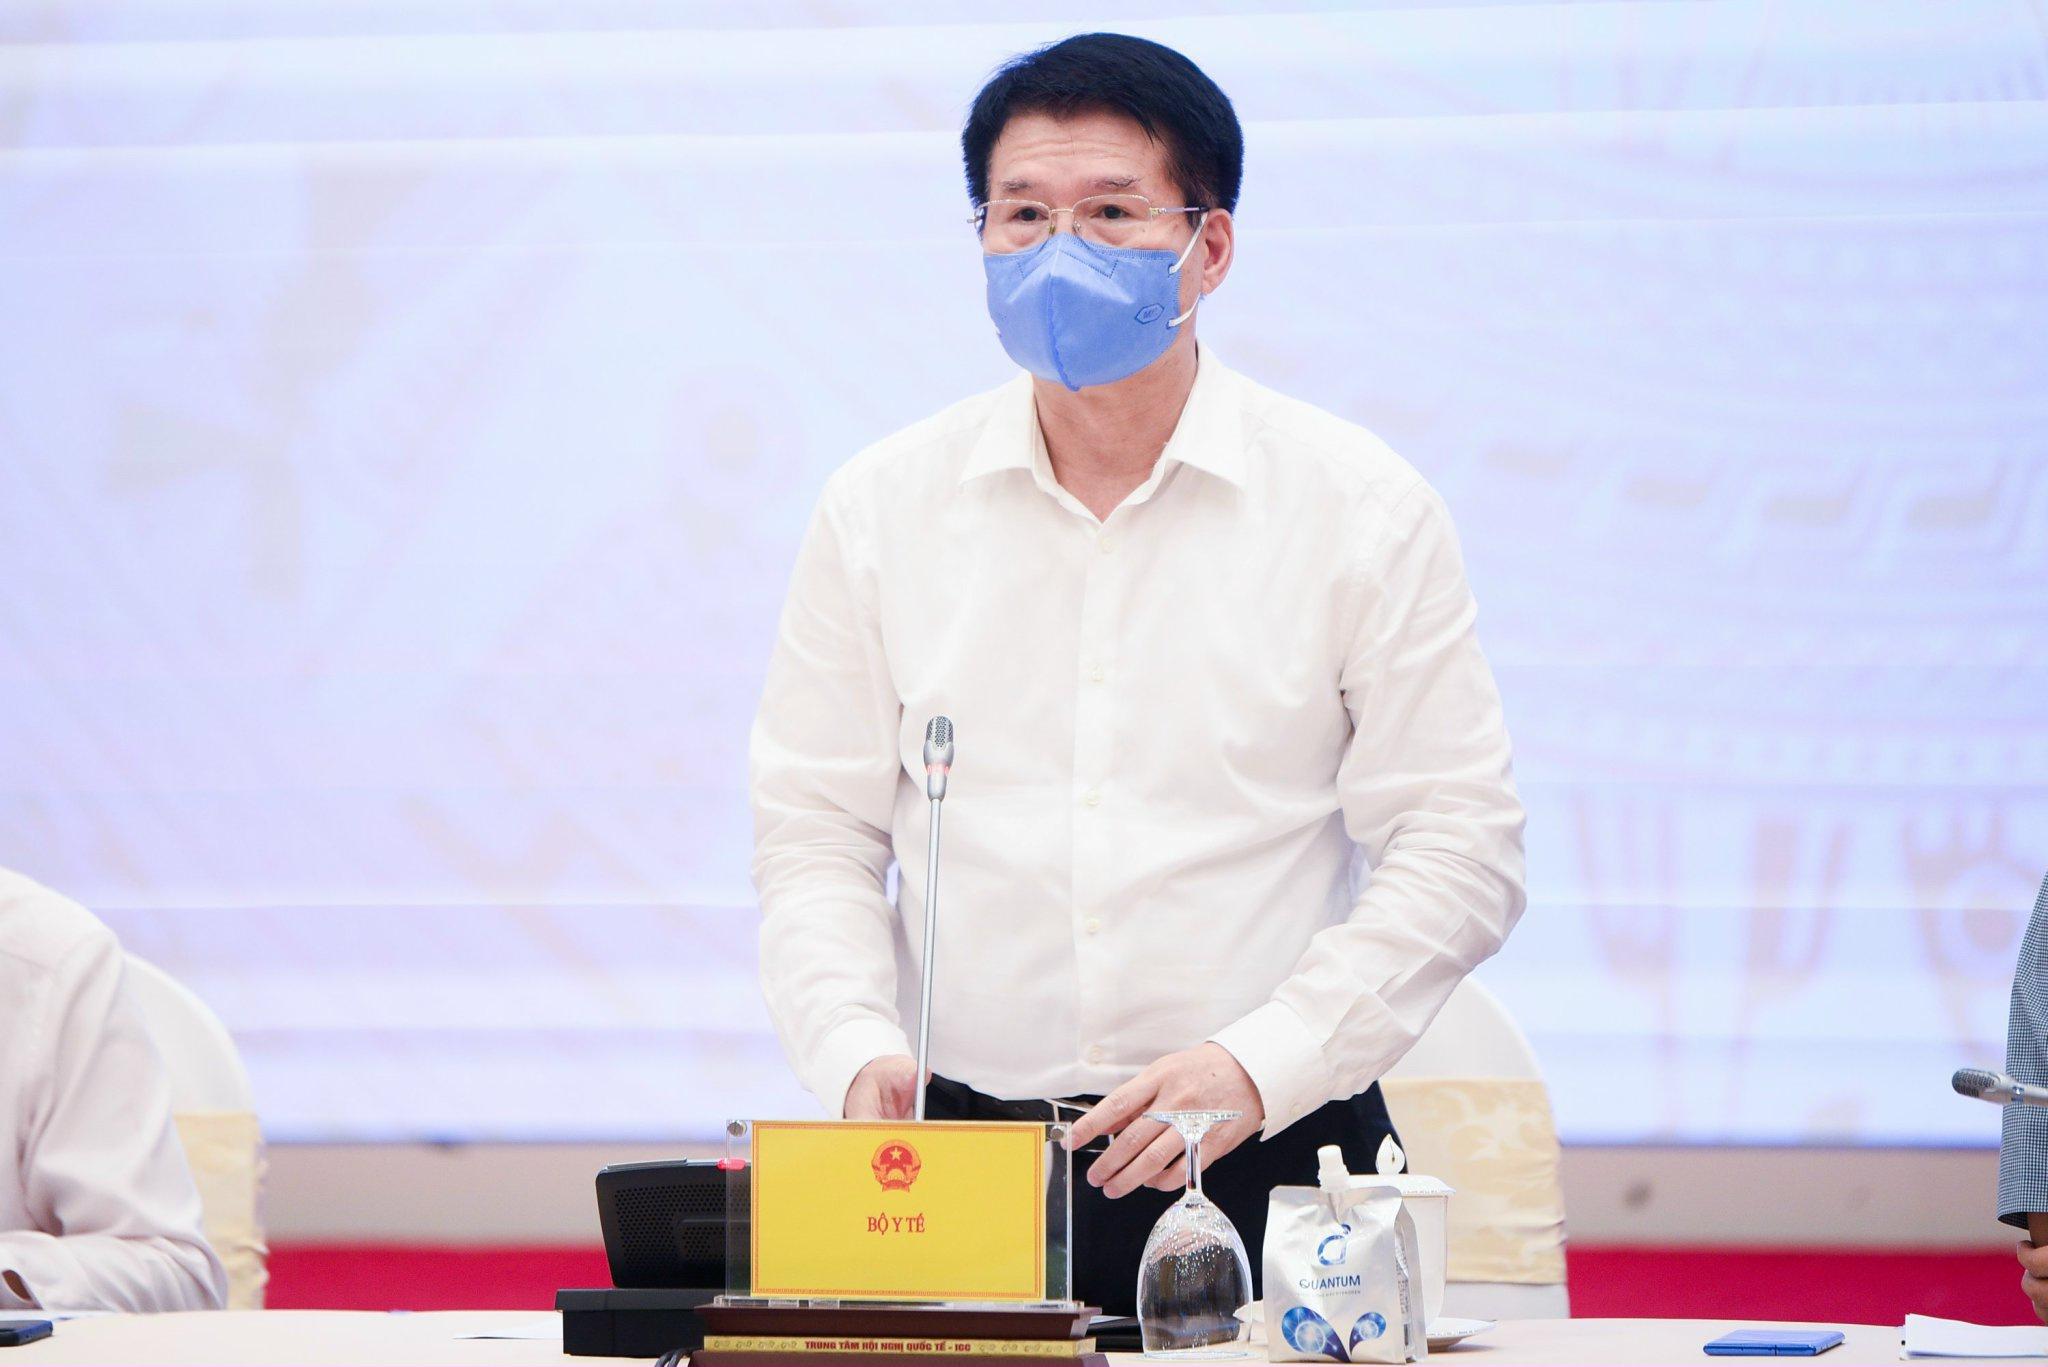 huong dan doanh nghiep nhap vaccine covid 19 anh 1